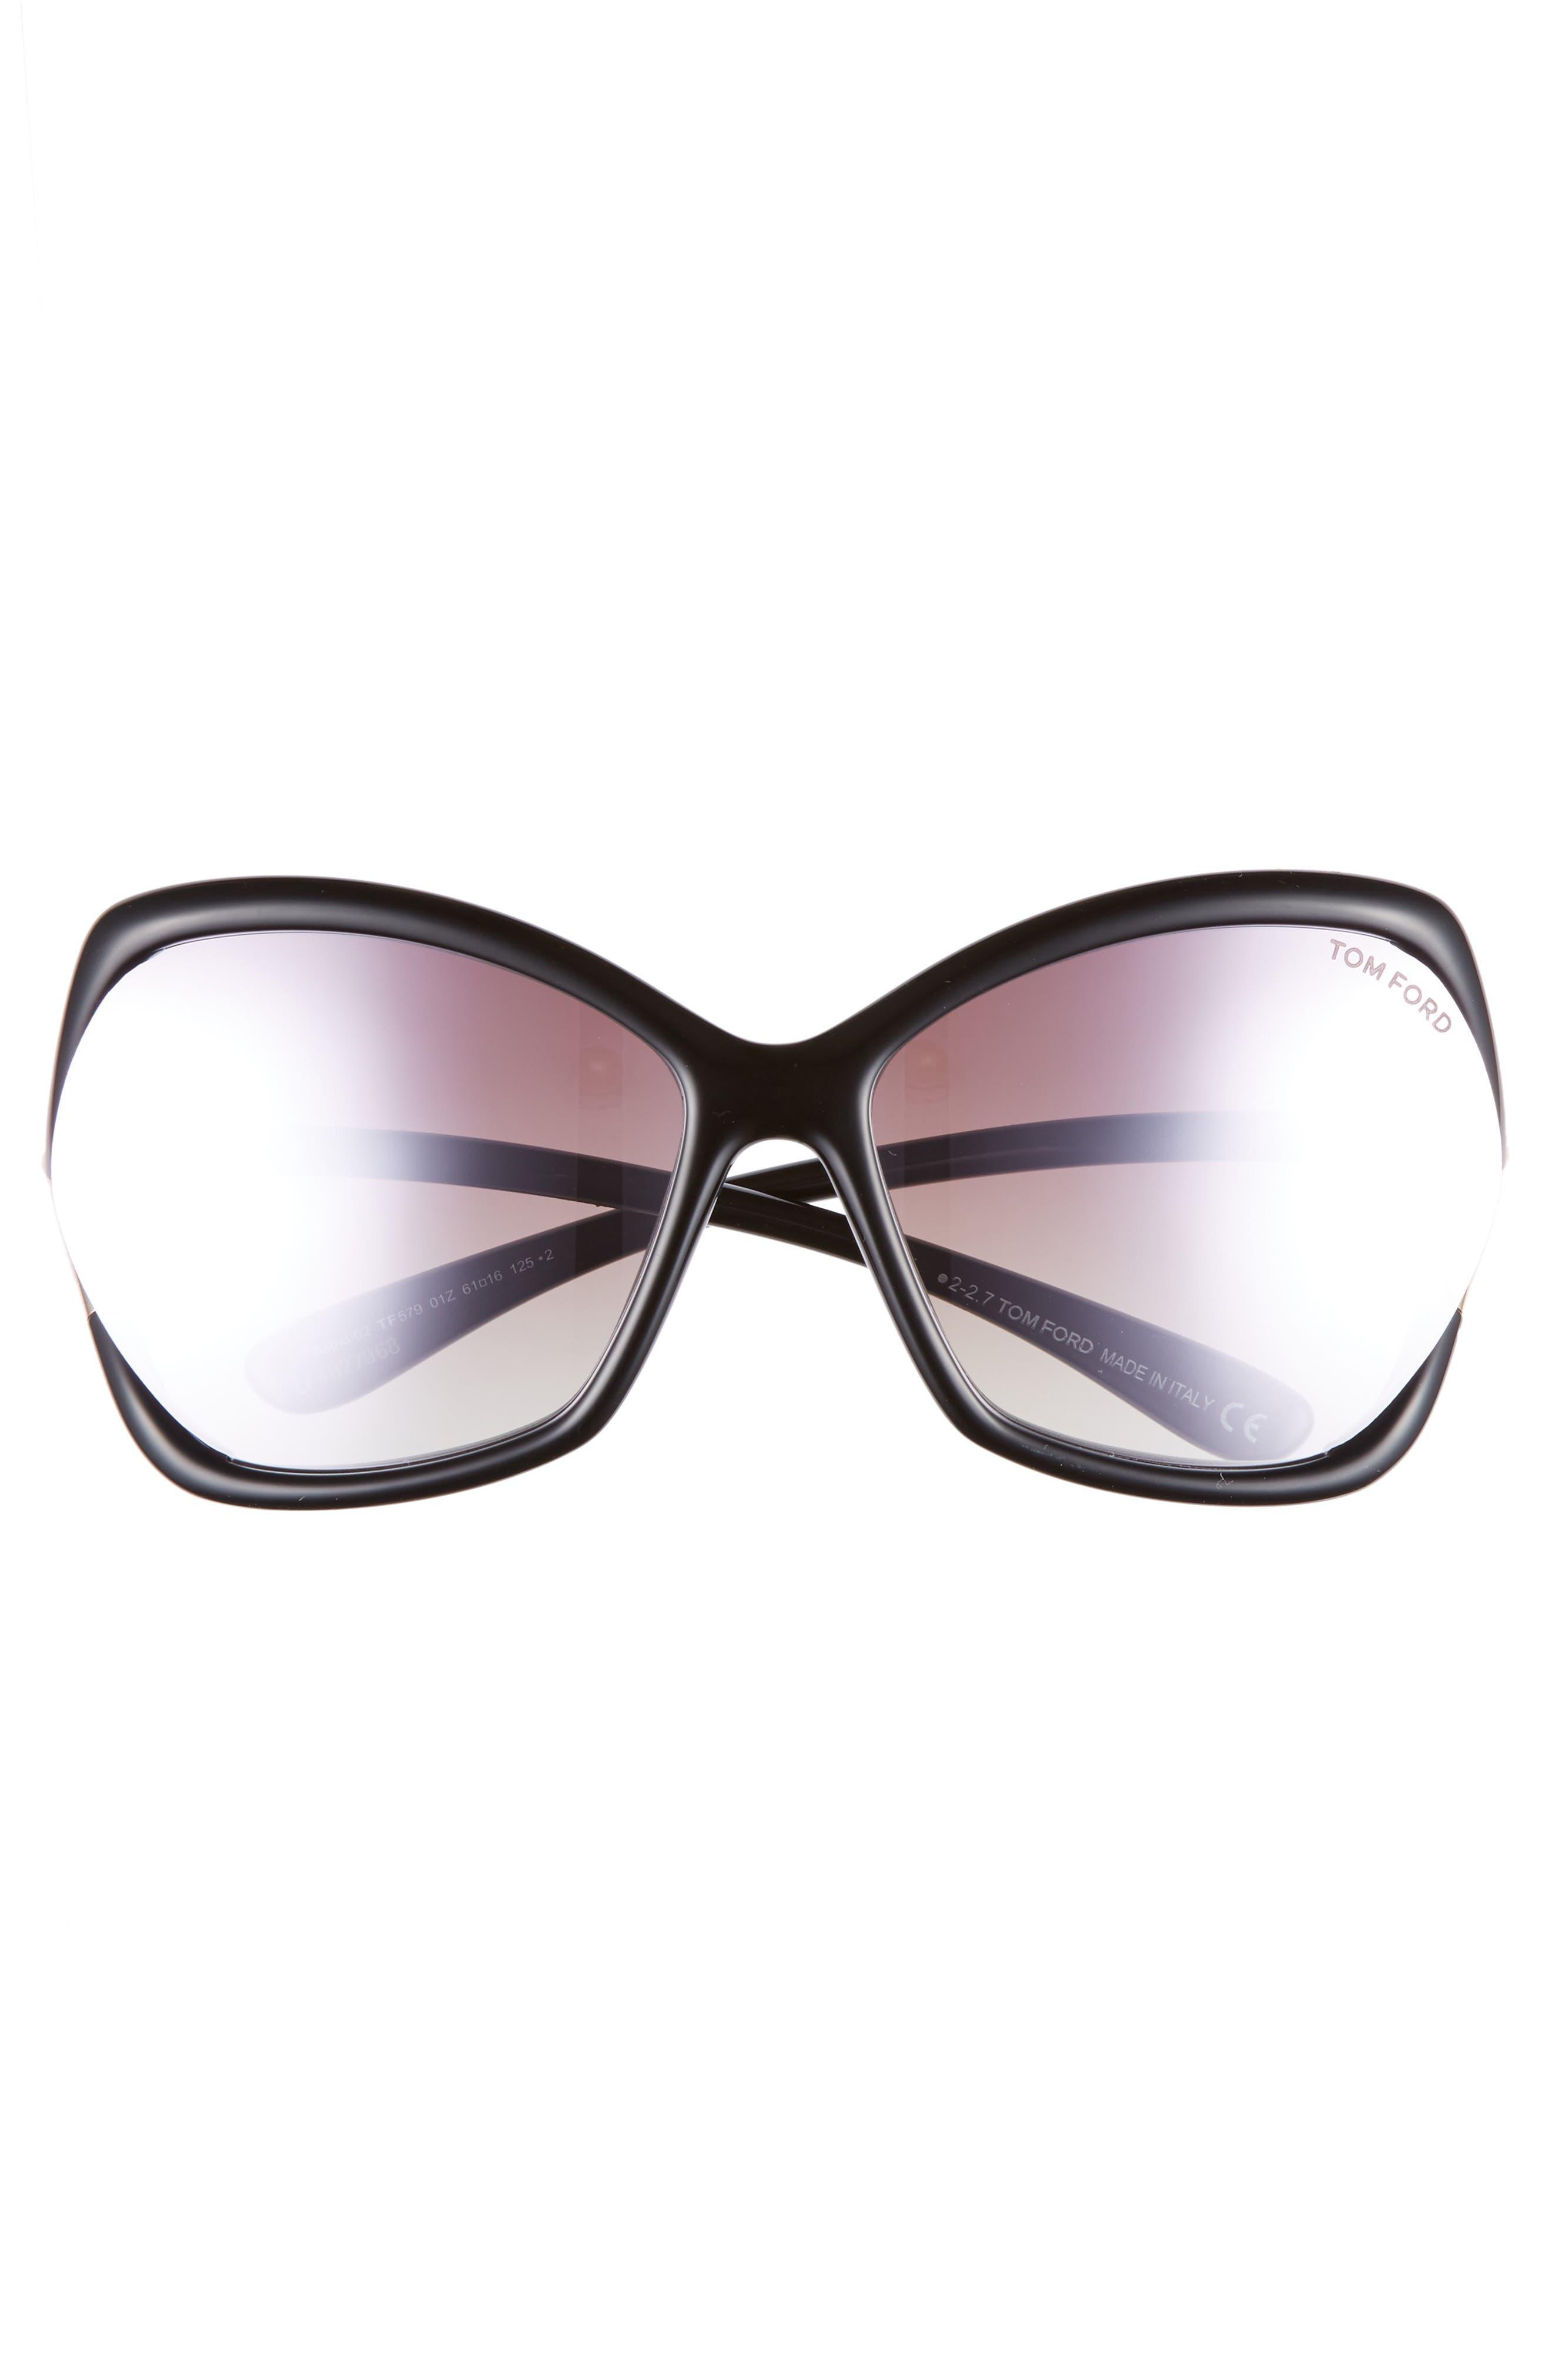 Astrid 61mm Geometric Sunglasses,                             Alternate thumbnail 3, color,                             Black/ Rose Gold/ Pink/ Silver